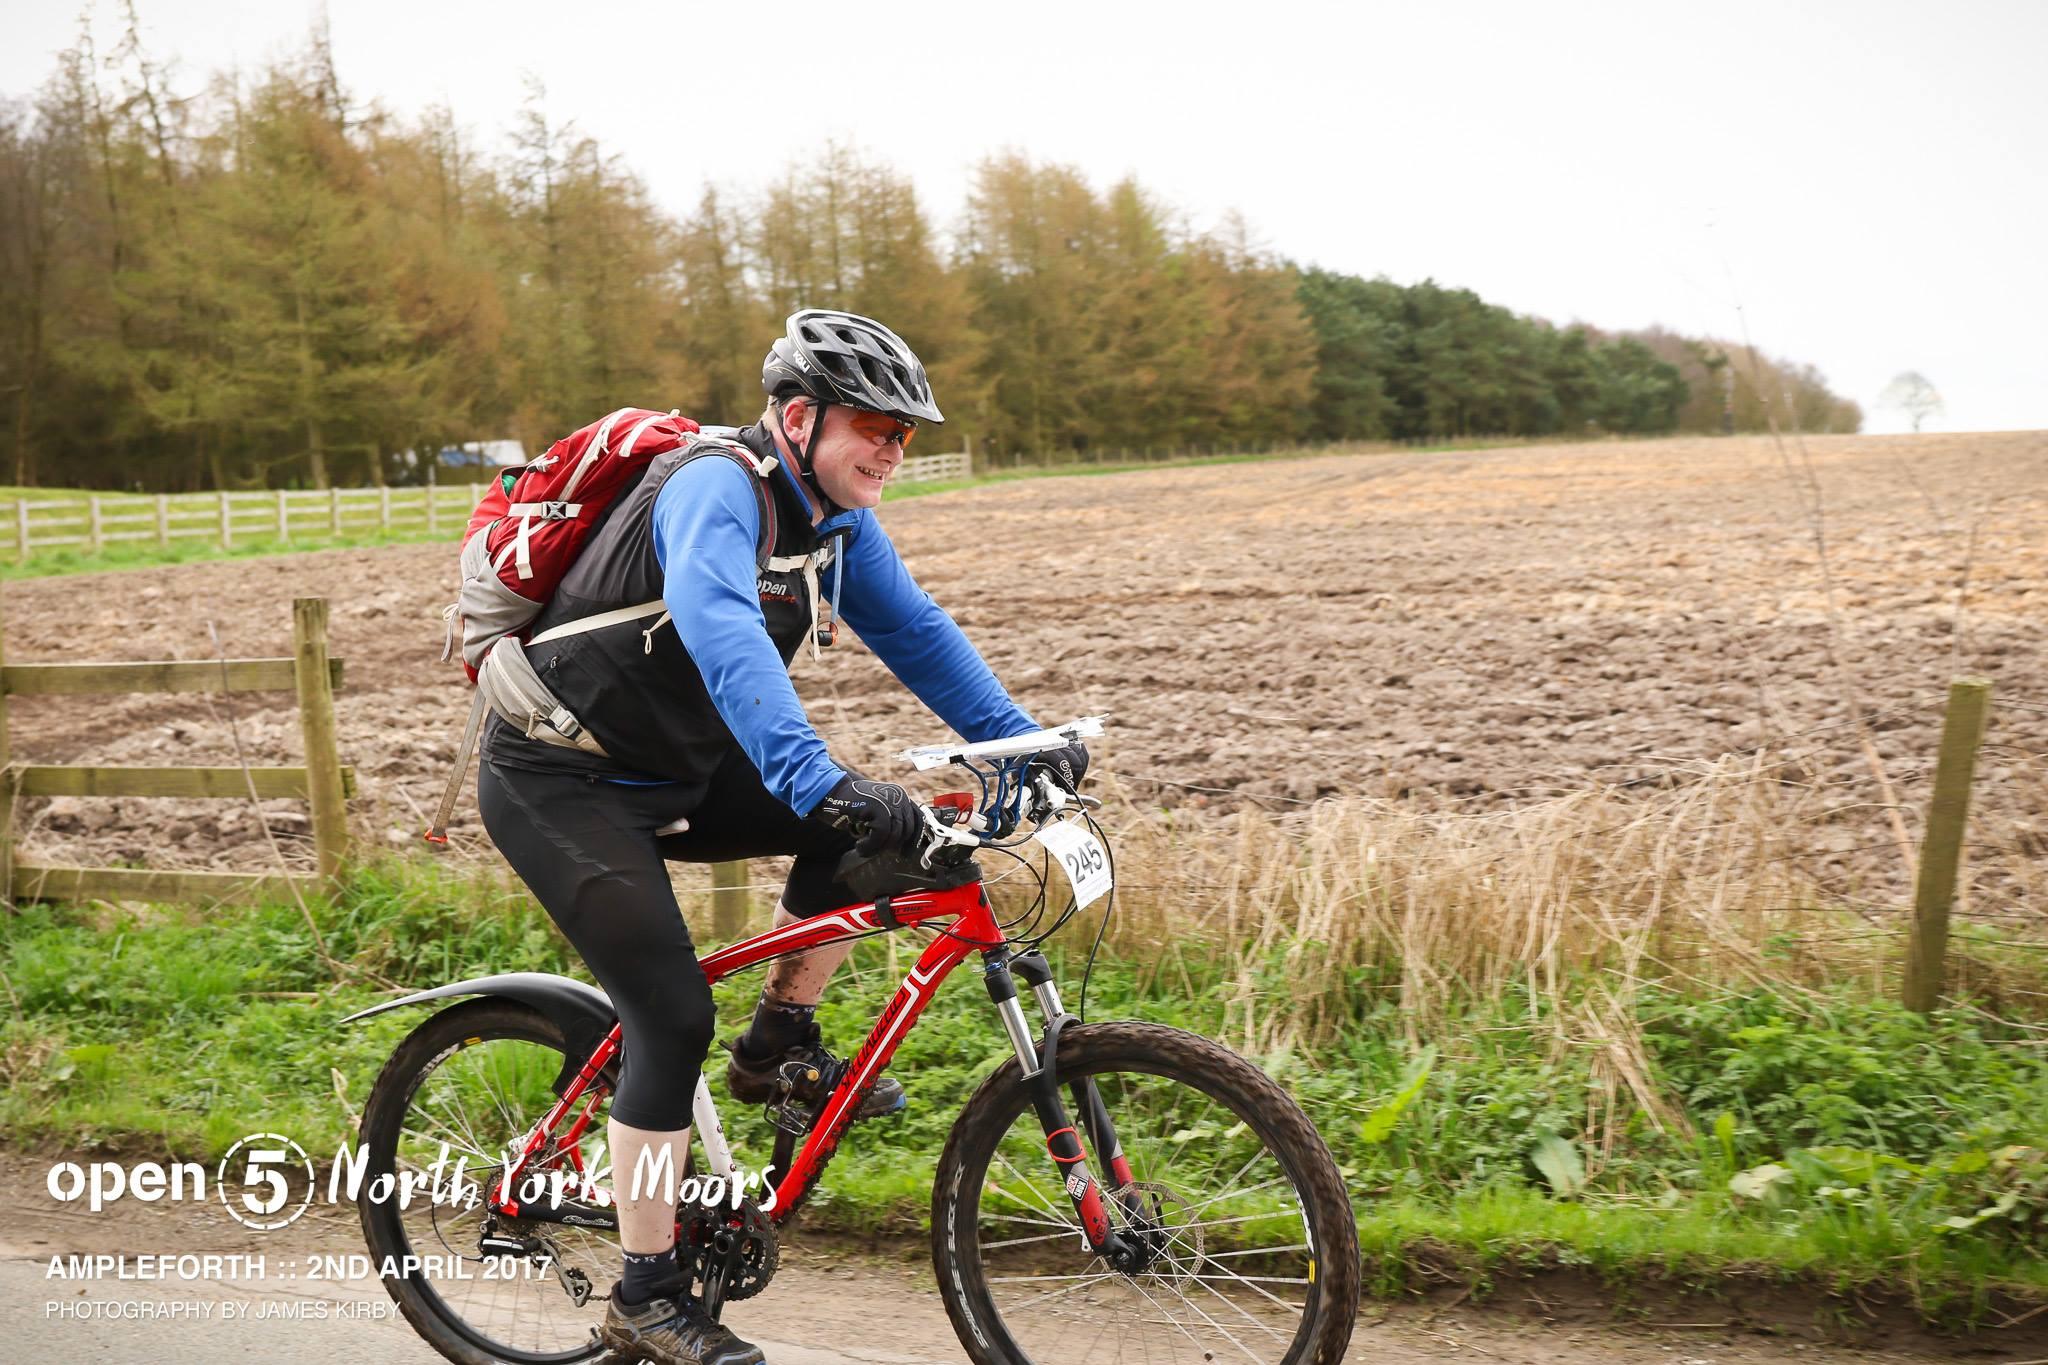 MTB, Mountain Biking, Adventure Racing, Navigation